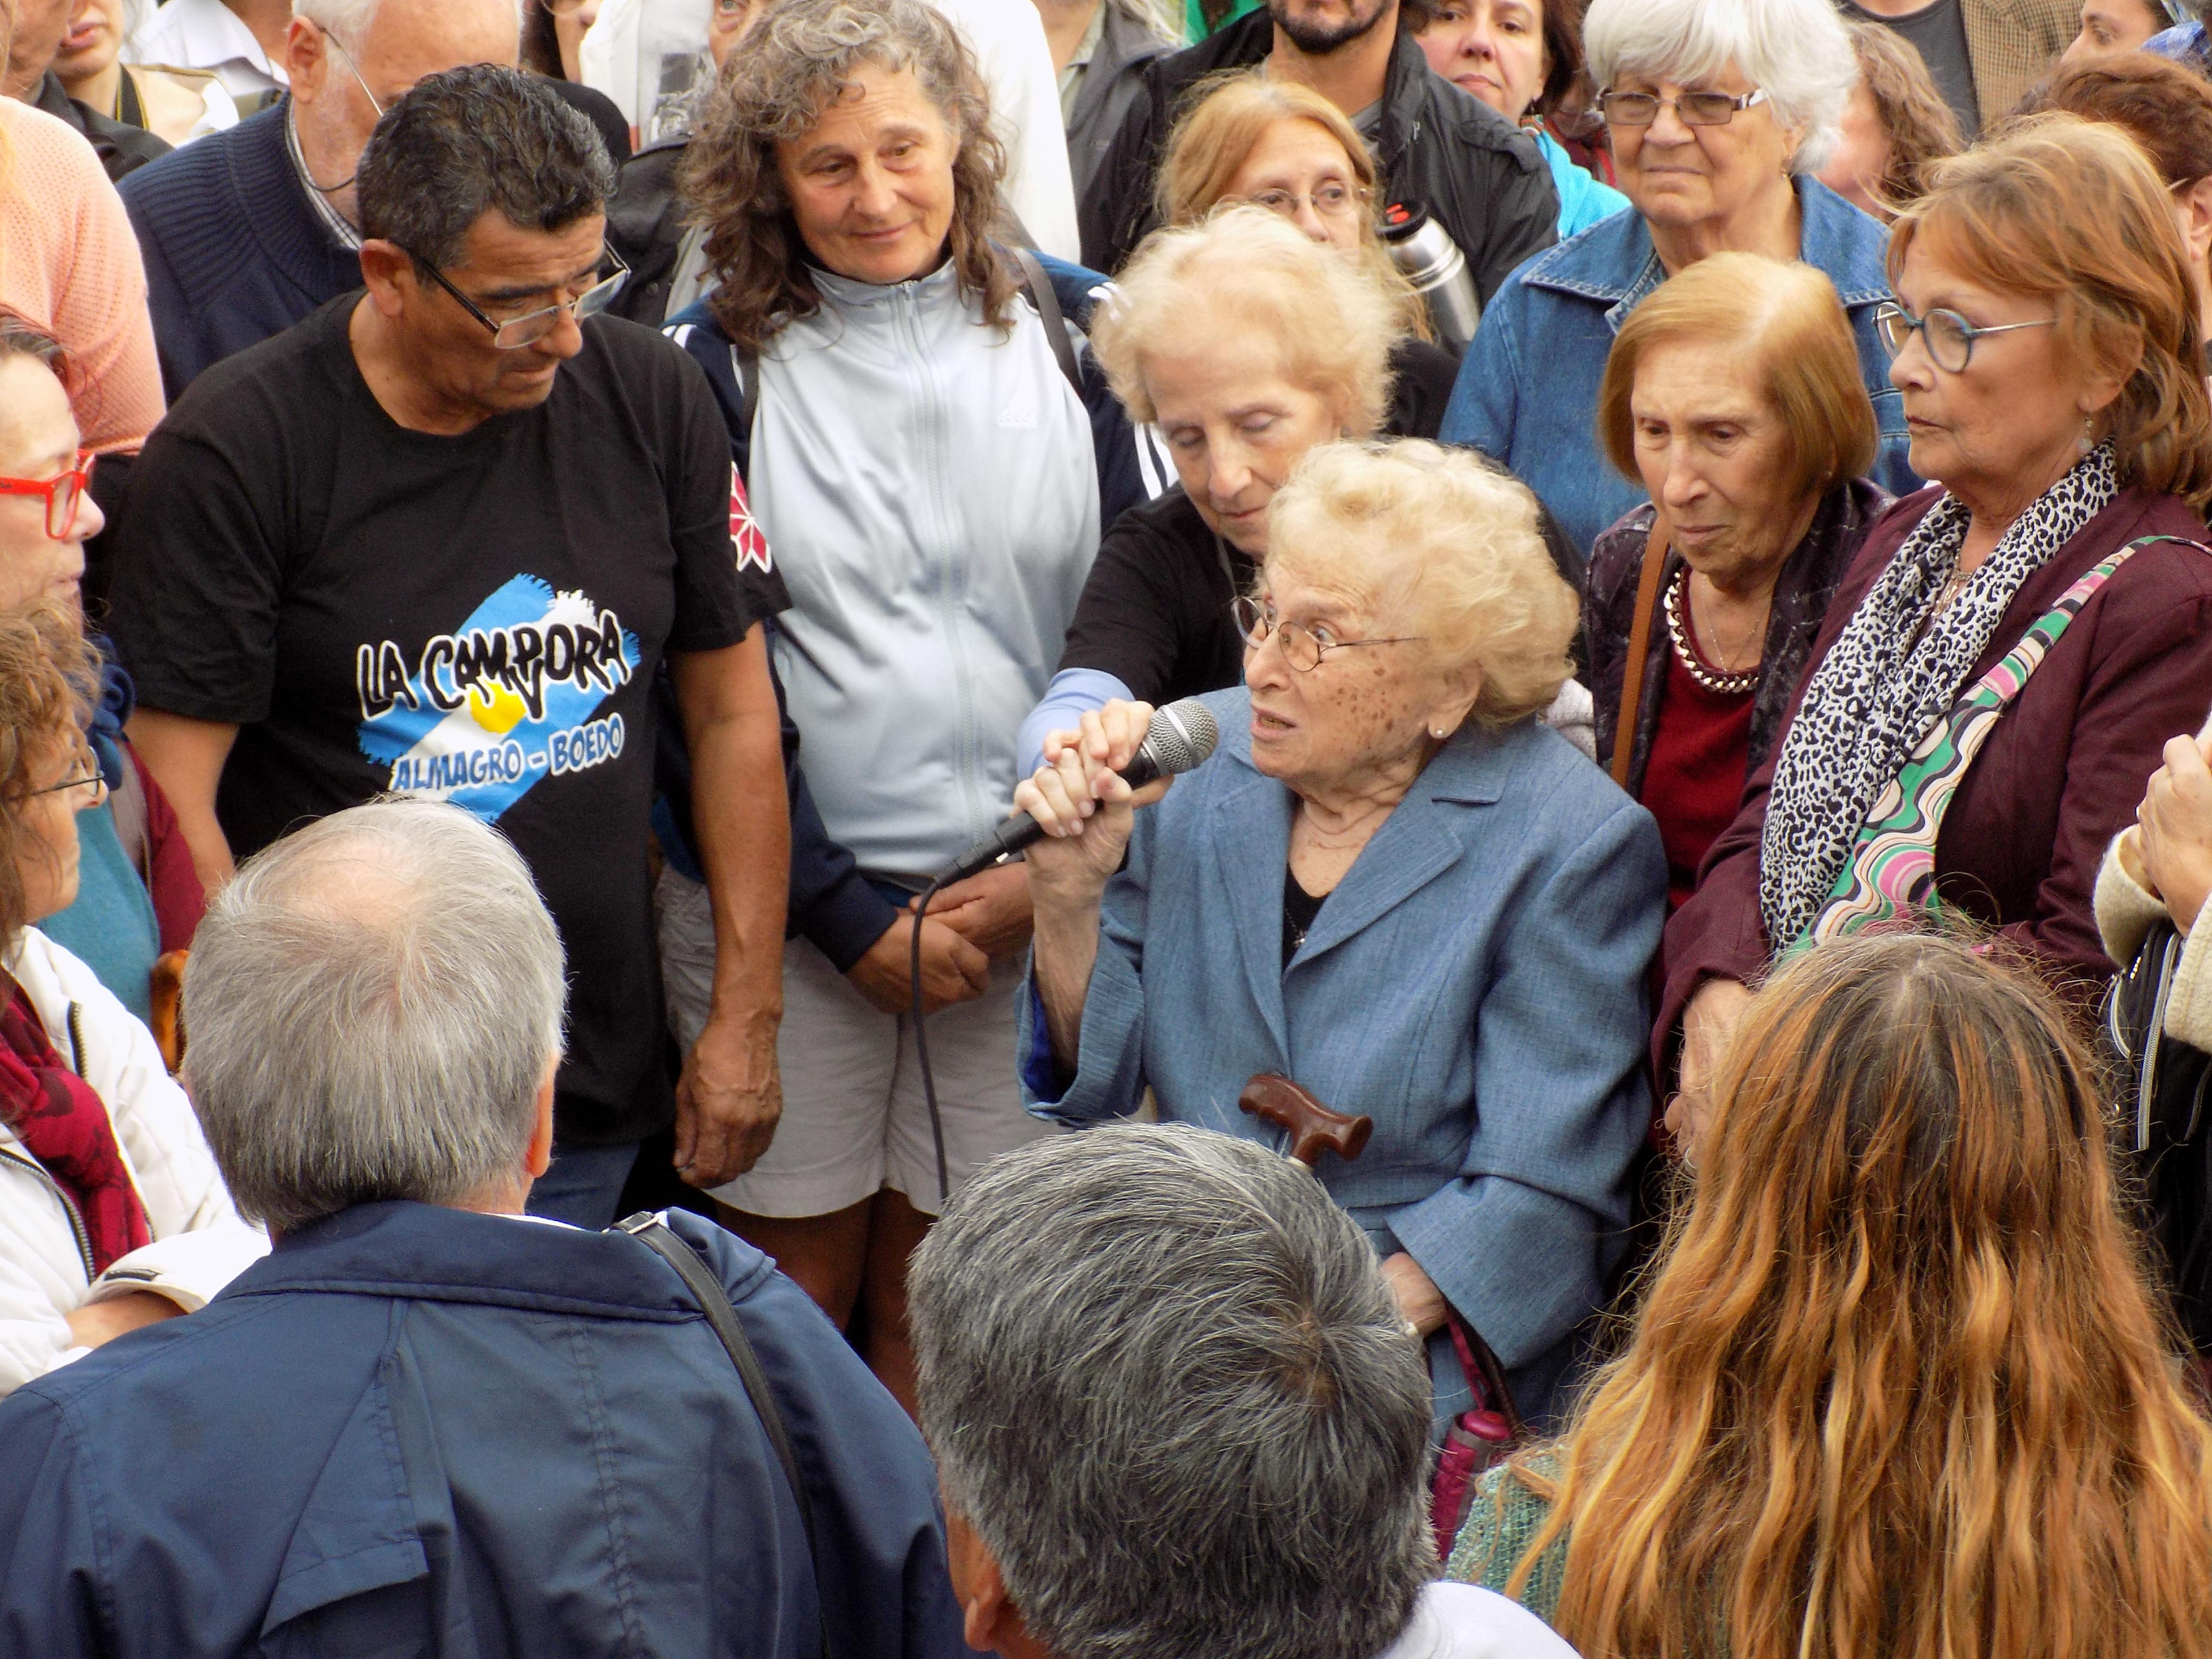 Rosa  ROISINBLIT mama de Patricia   ROISINBLIT, y vicepresidenta de abuelas de plaza de mayo